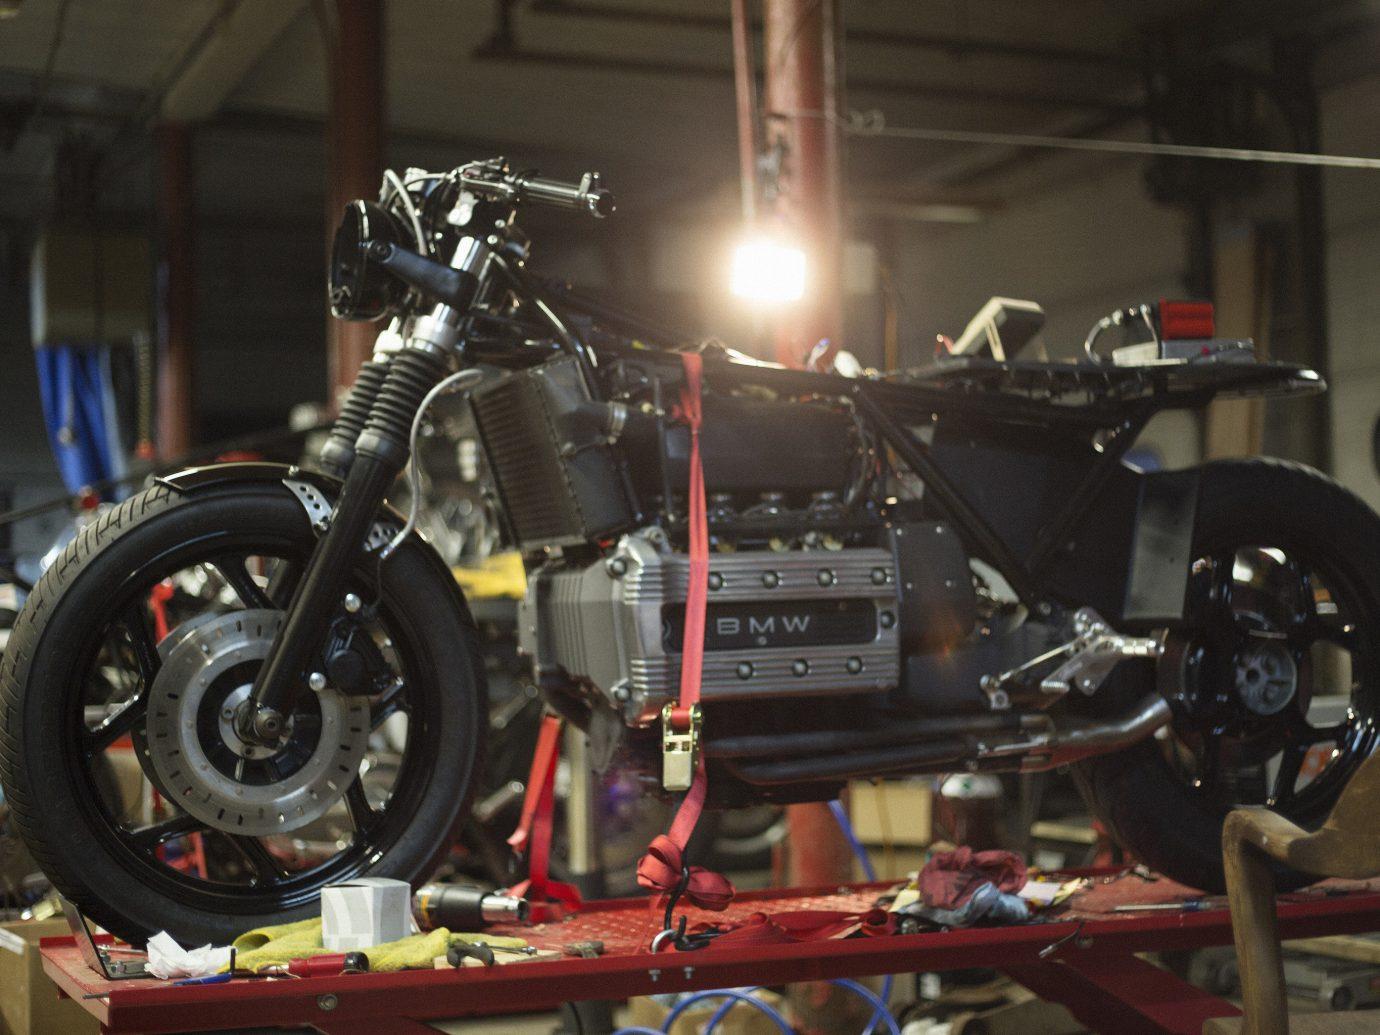 Trip Ideas car motorcycle vehicle wheel engine race track racing automobile make automotive engine part projector